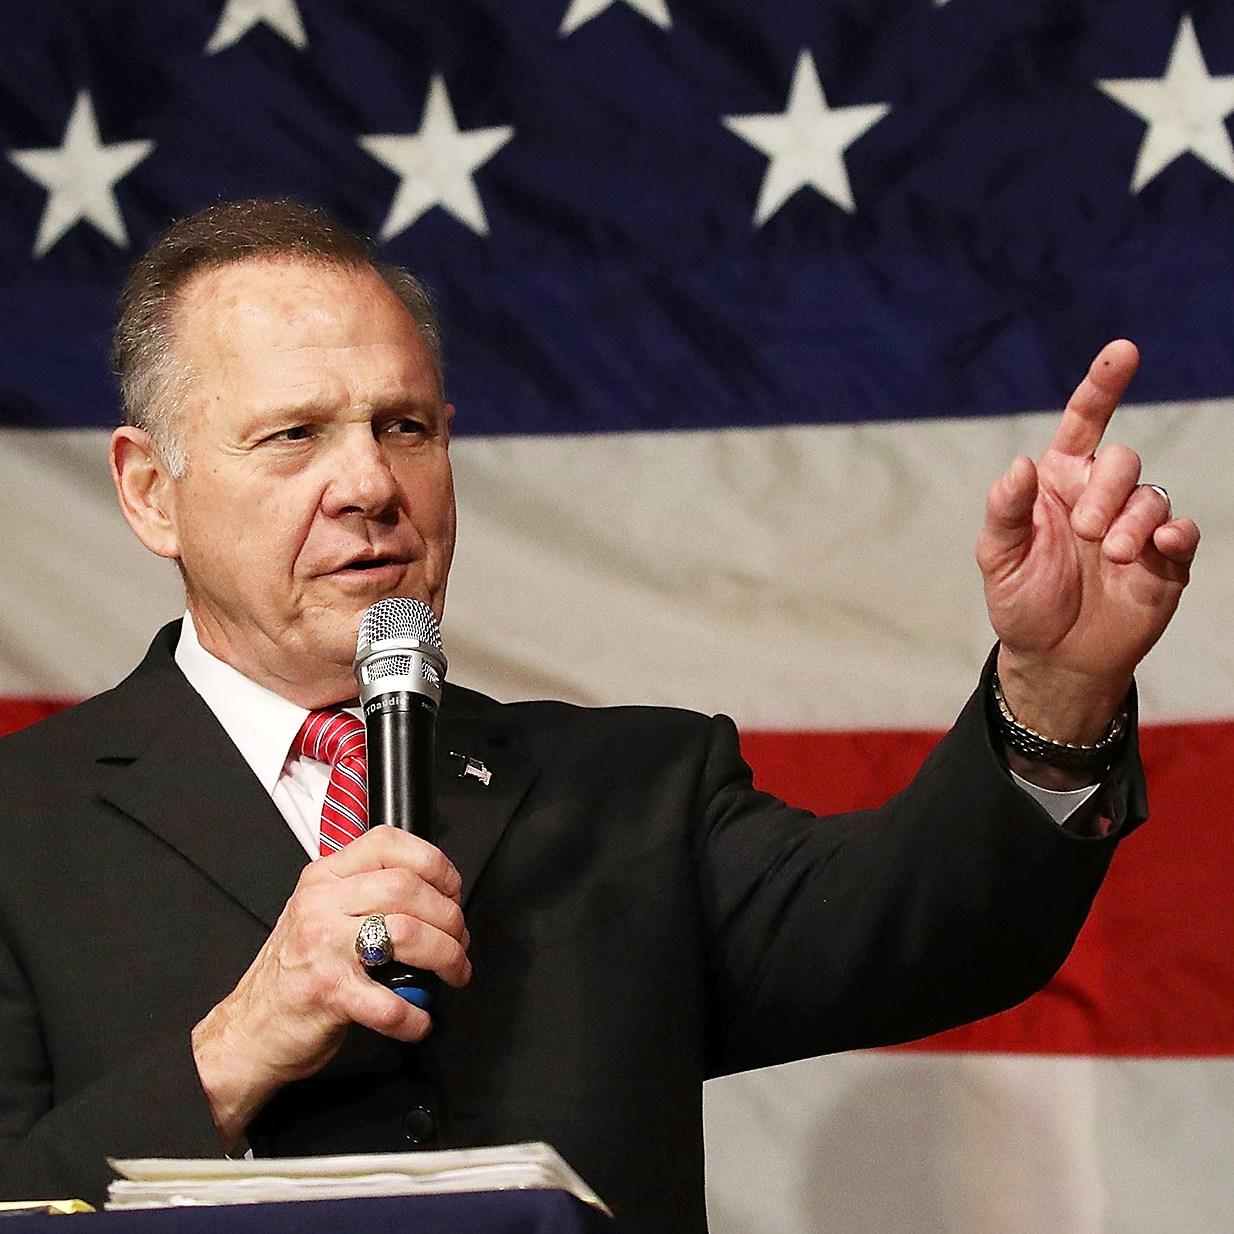 Republican Senatorial candidate Roy Moore